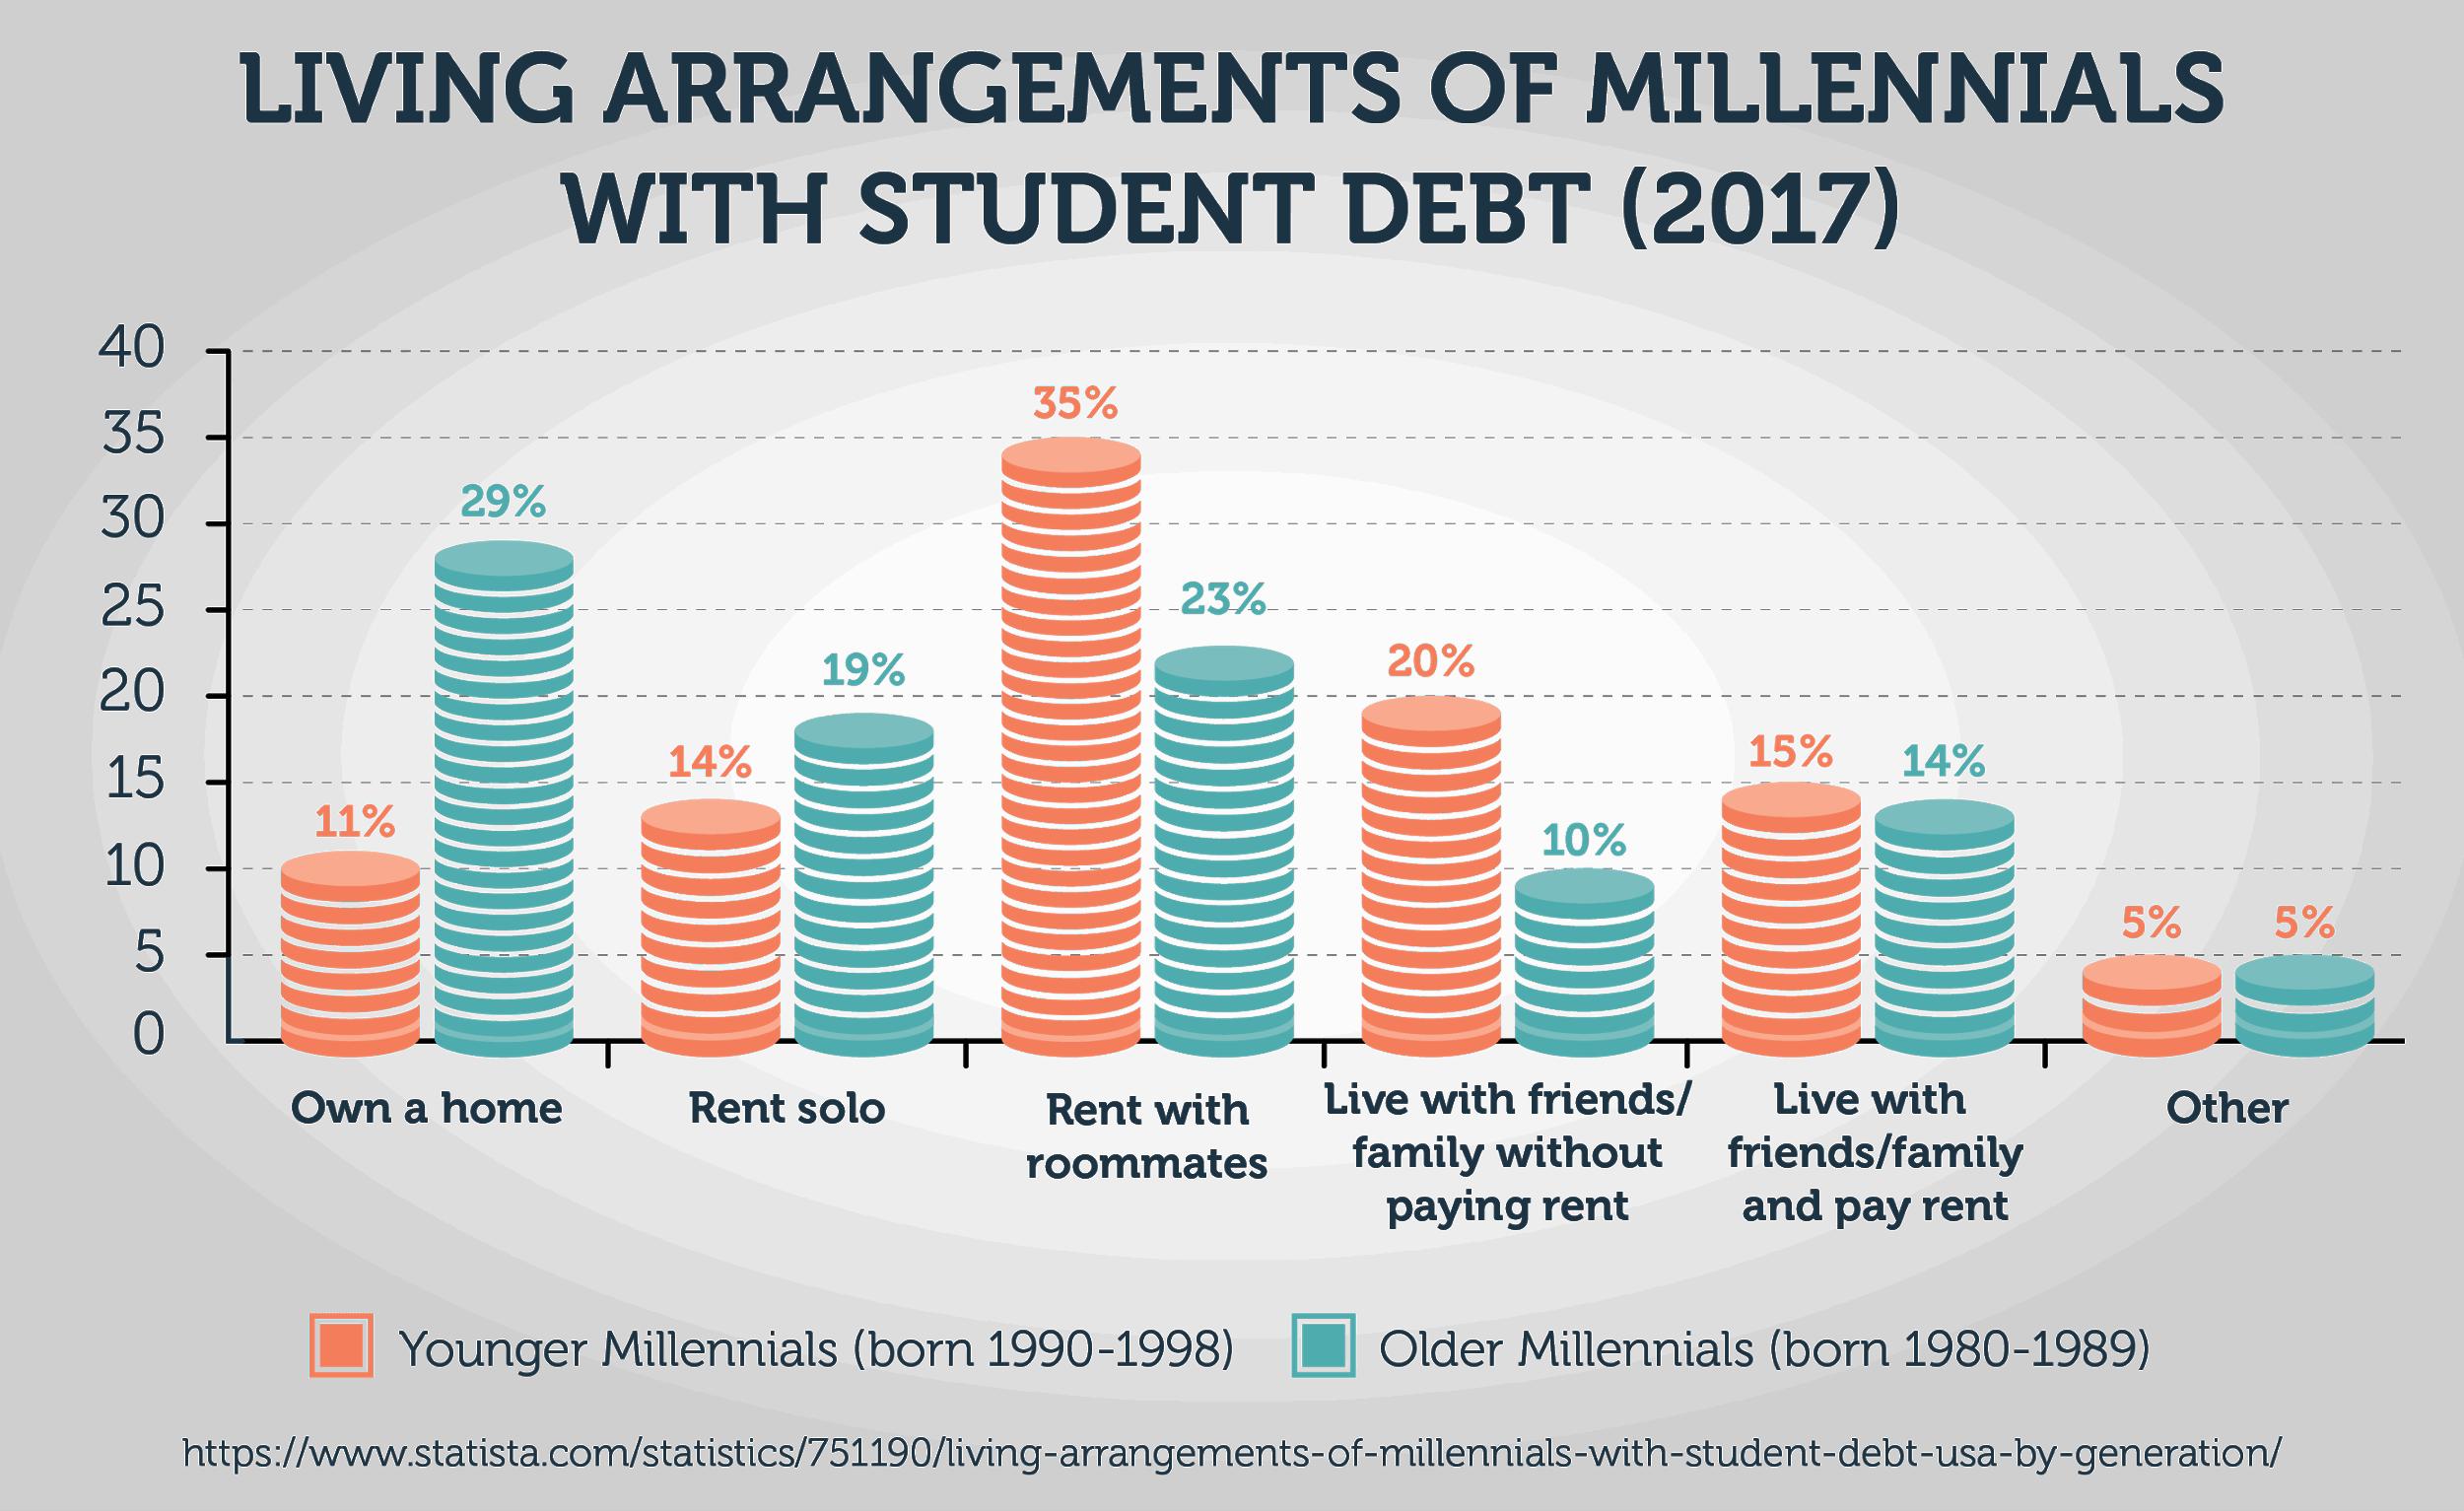 Living Arrangements of Millennials With Student Debt (2017)